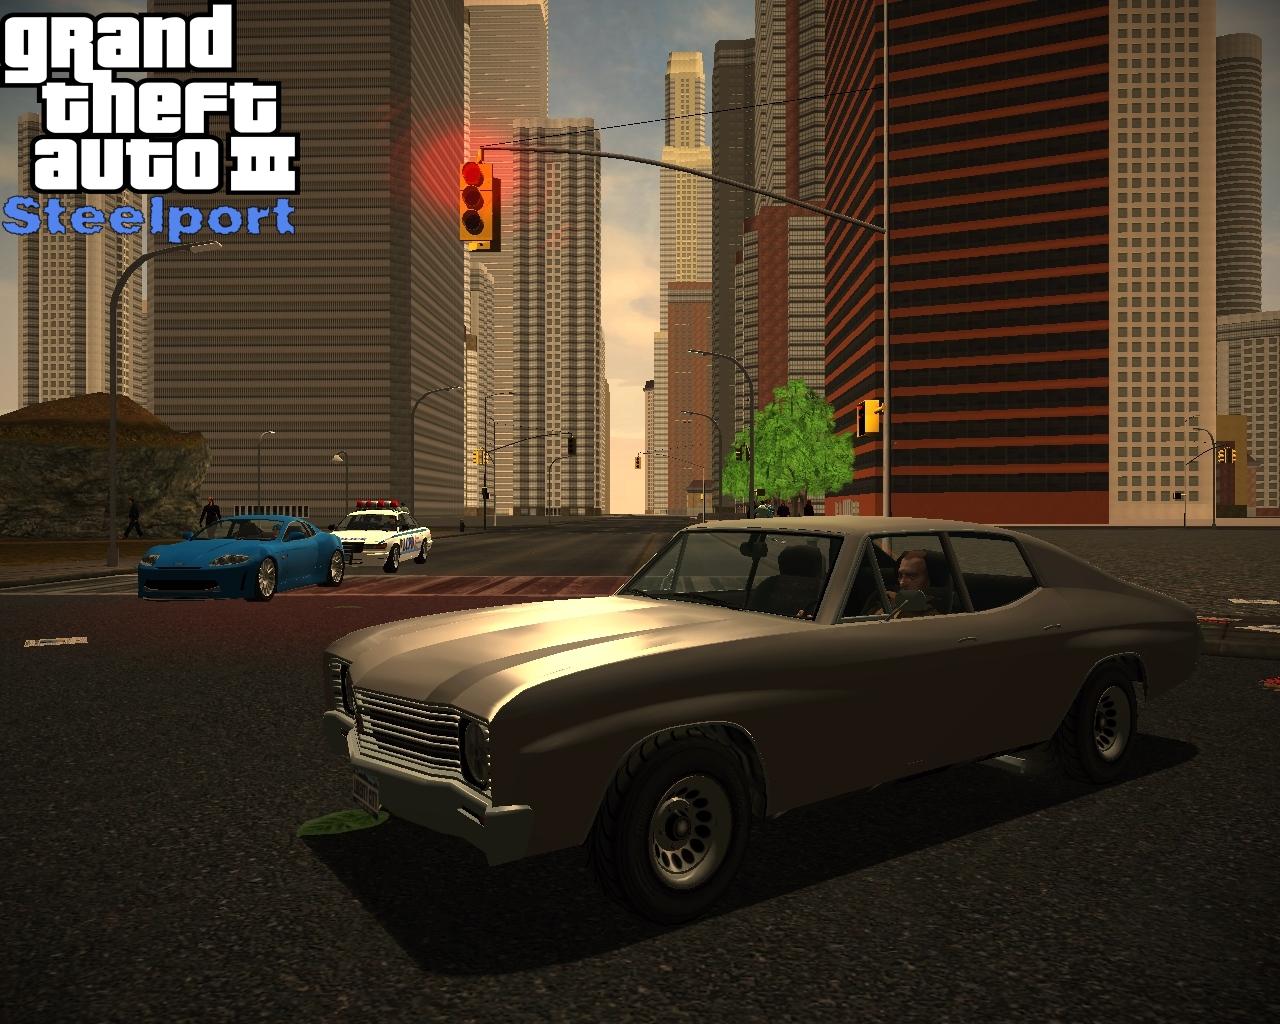 PRESENTATION1.jpg - Grand Theft Auto 3